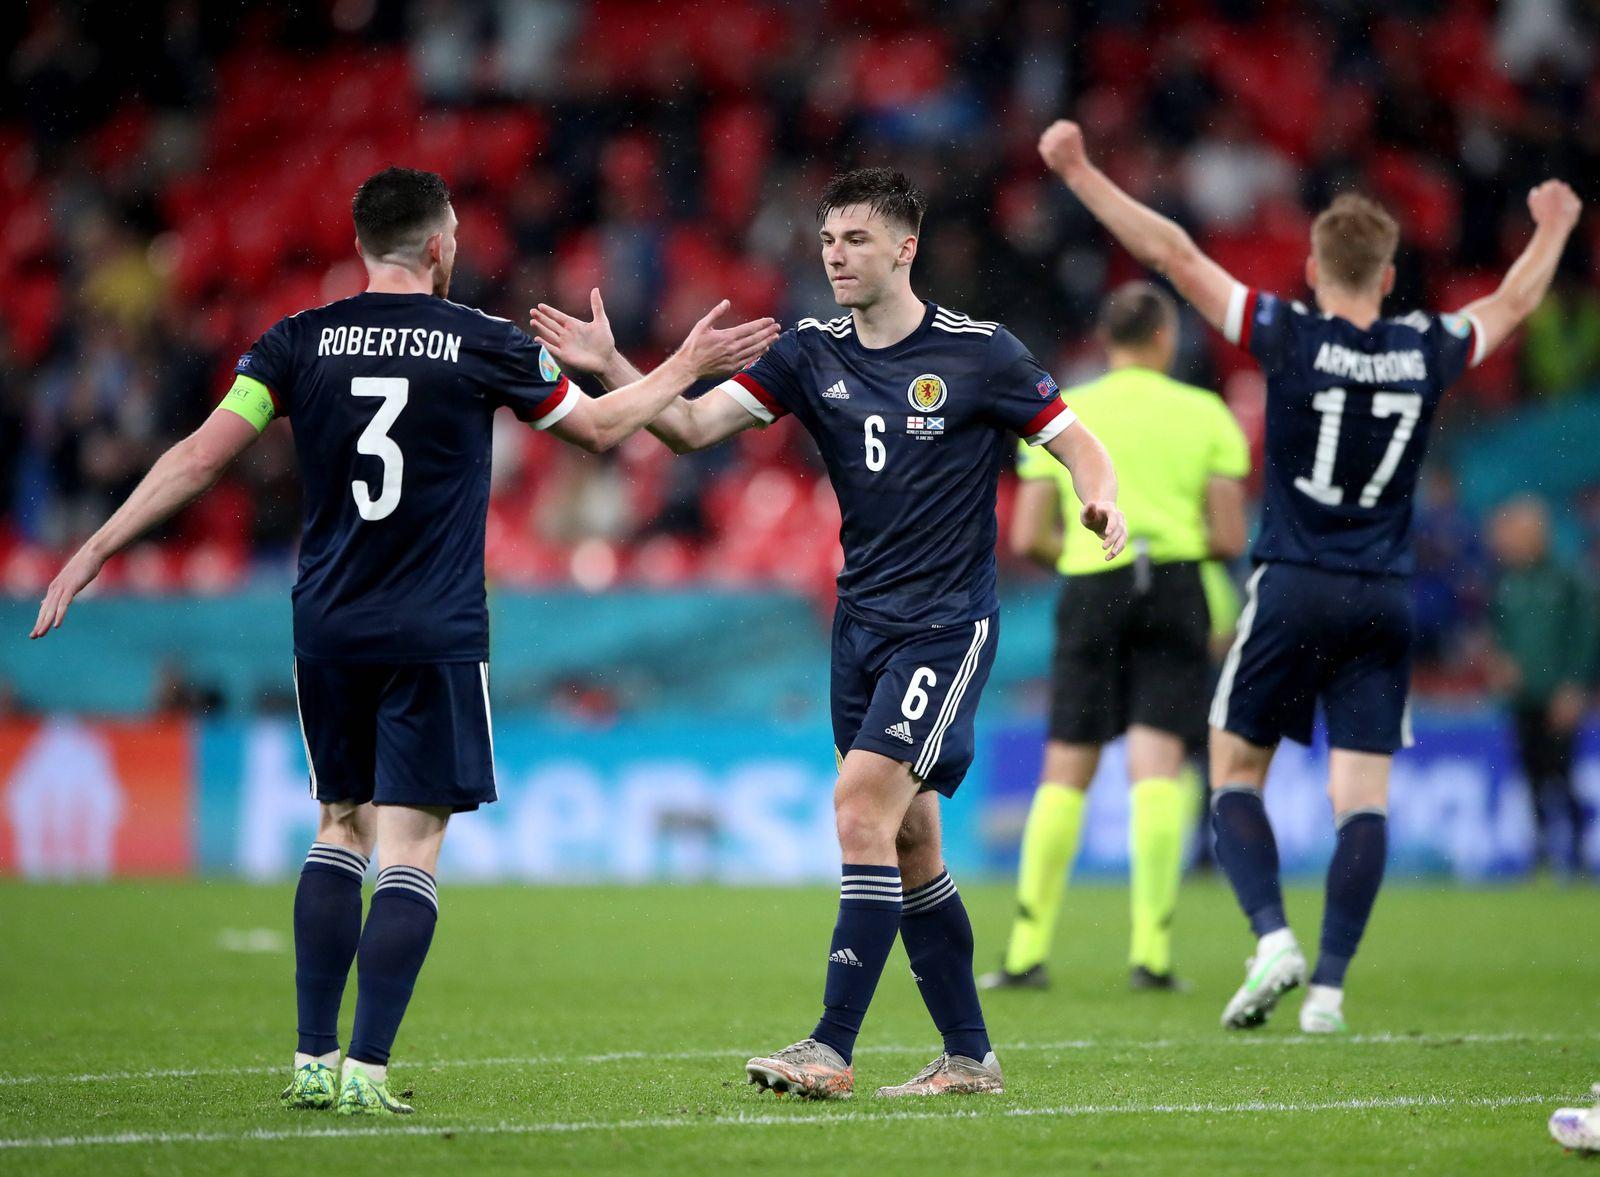 England v Scotland - UEFA EURO, EM, Europameisterschaft,Fussball 2020 - Group D - Wembley Stadium Scotland s Andrew Robe